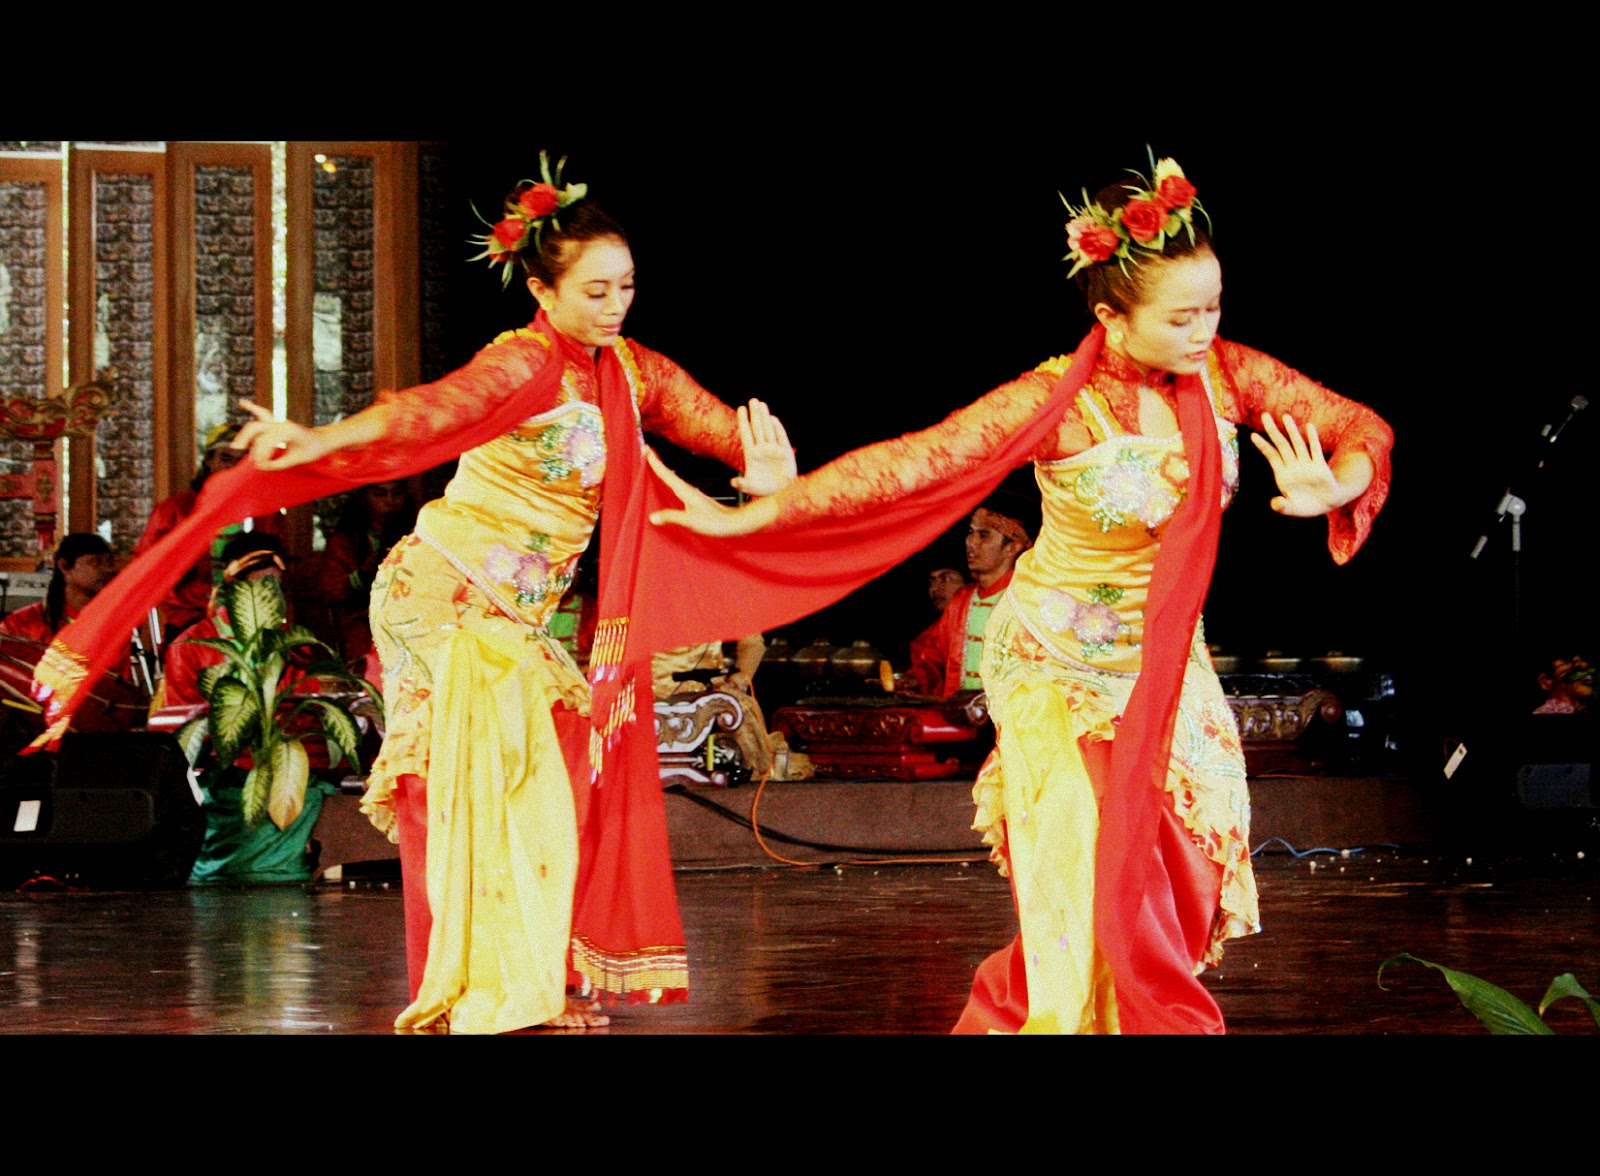 Tari Jaipong Tarian Tradisional Dari Jawa Barat Negeriku Indonesia